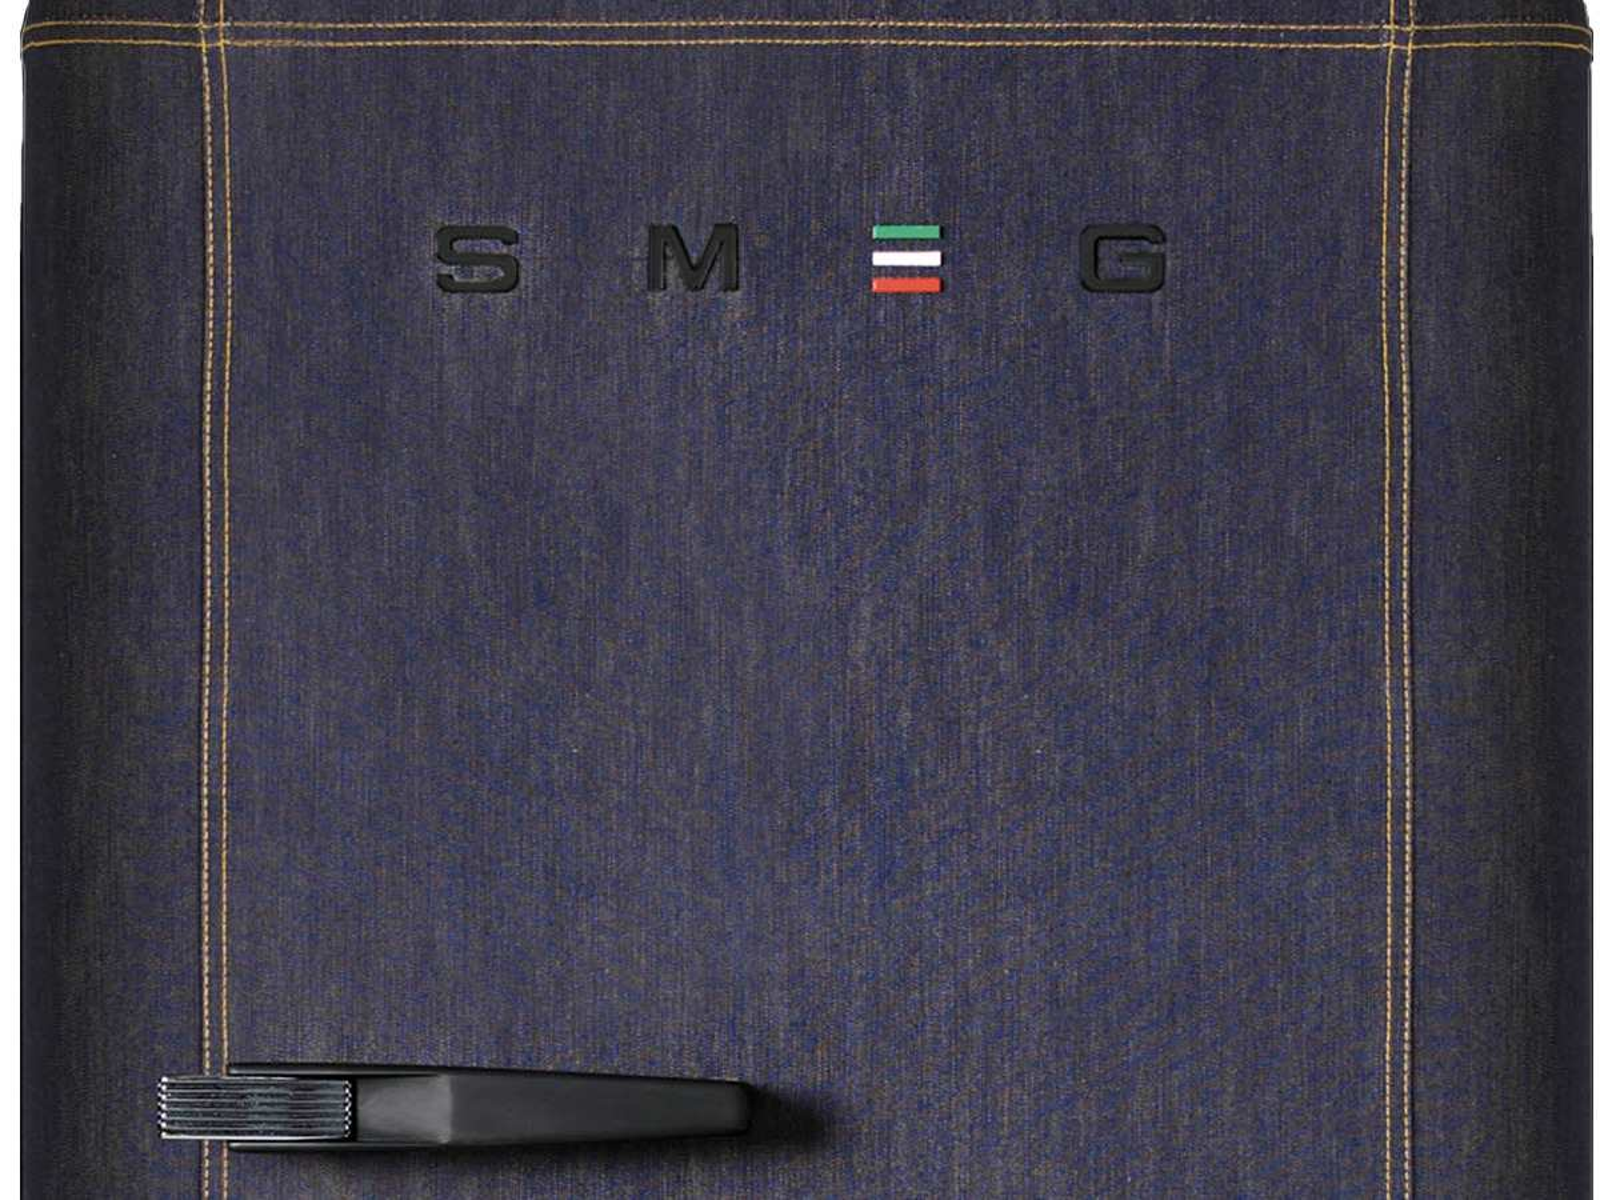 Smeg Kühlschrank Verkaufen : Smeg fab28rdb standkühlschrank jeans denim blue